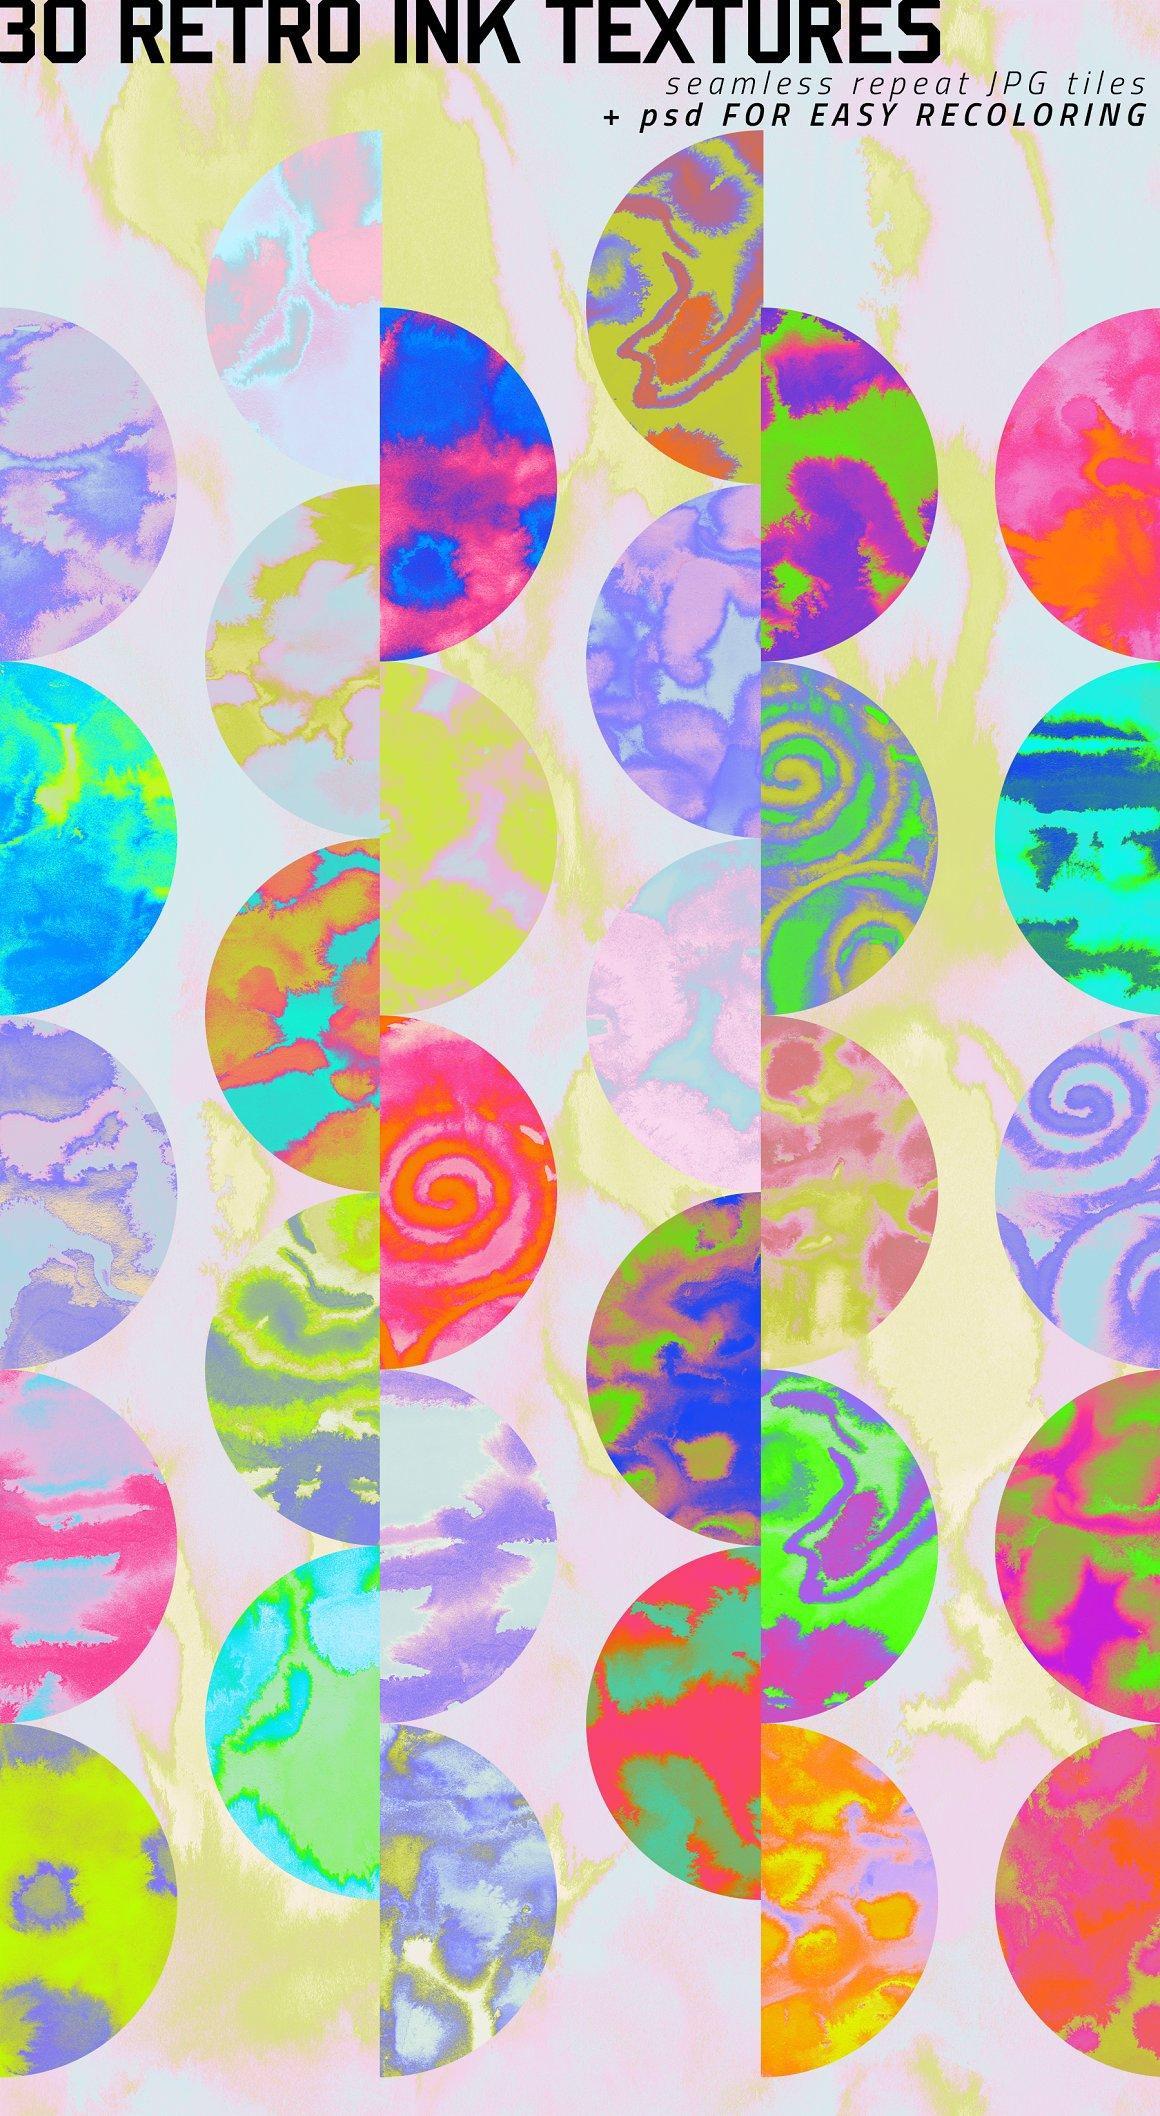 [Image: all-patterns-.jpg?1617031237&s=e026a5266...5b7d533eda]